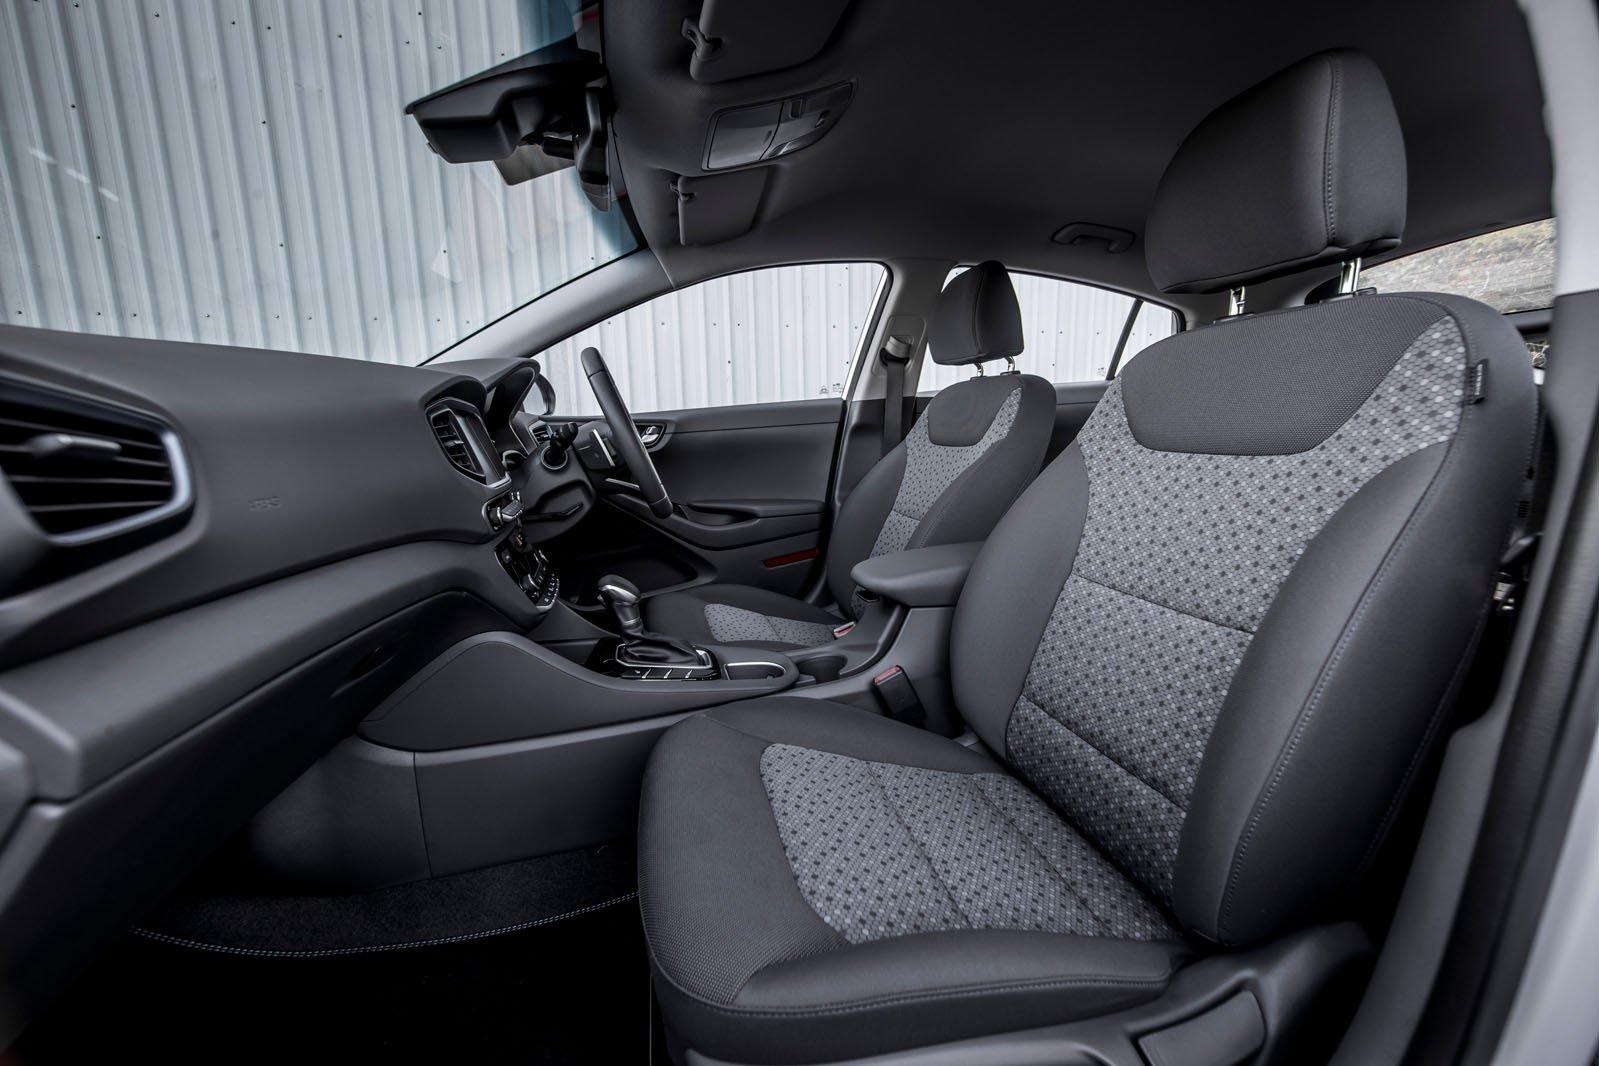 Hyundai Ioniq 2018 front seats